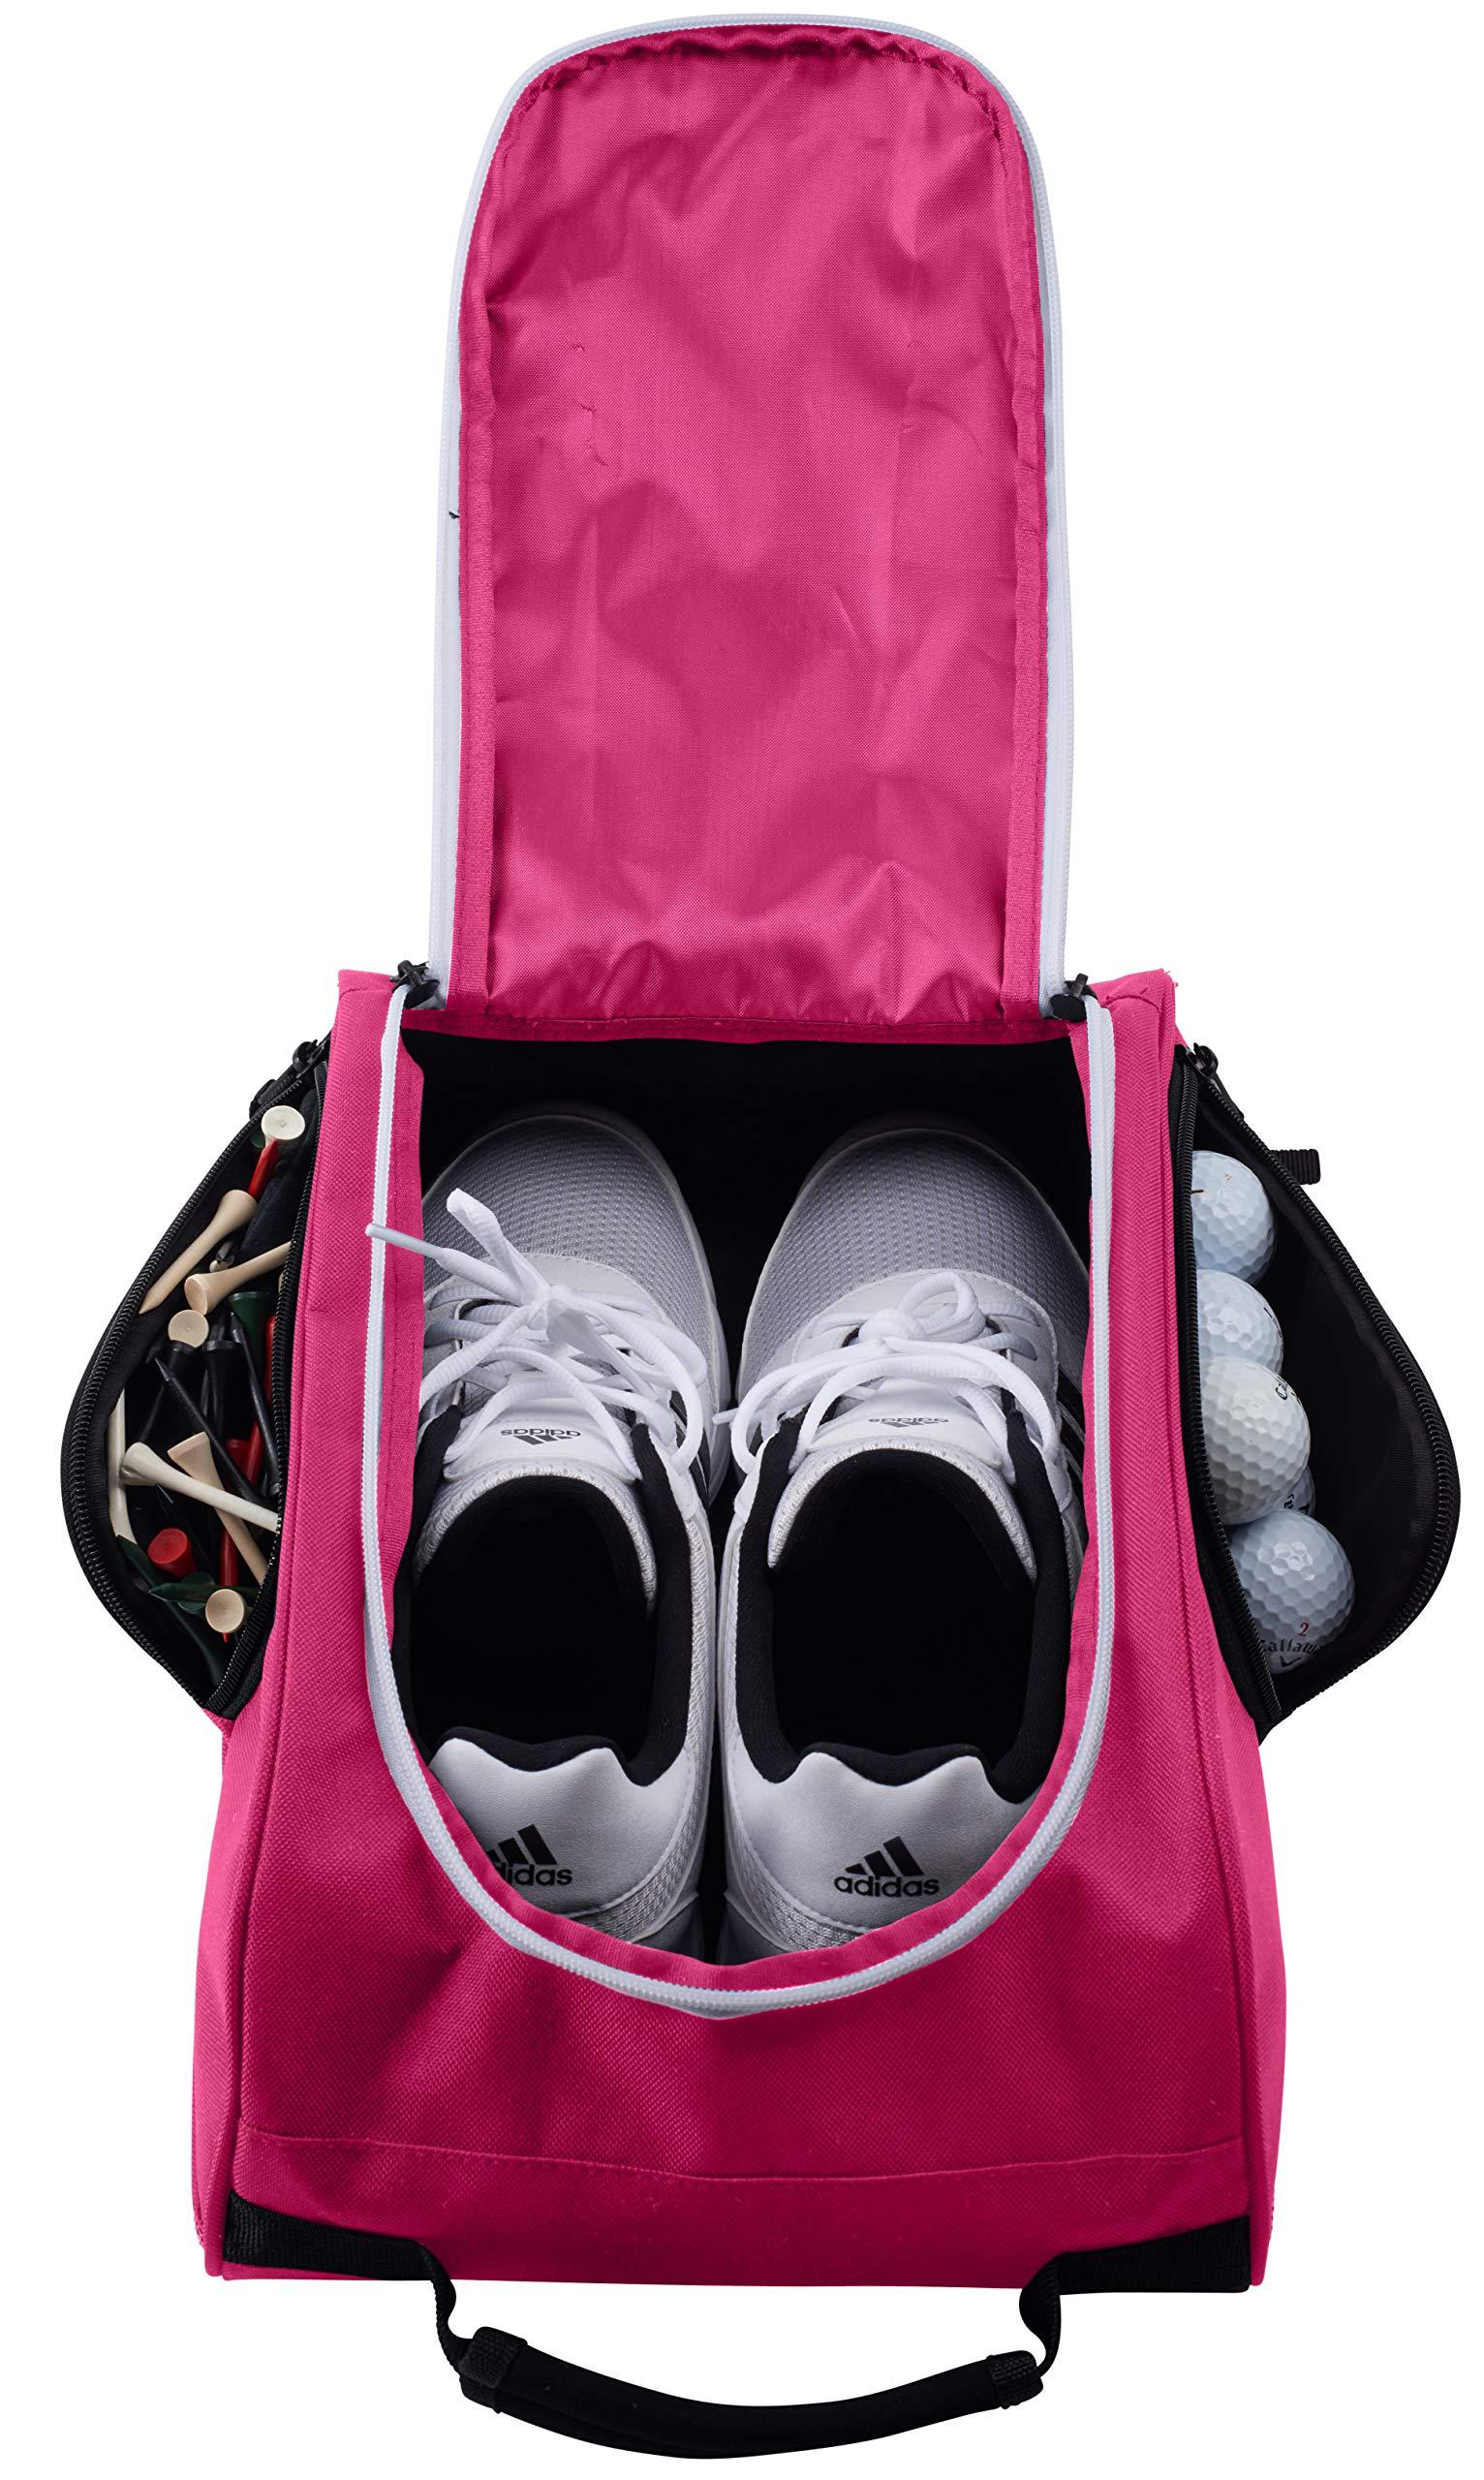 Athletico Golf Shoe Bag - Zippered Shoe Carrier Bags Ventilation   Outside  Pocket Socks 9ed7206f12e